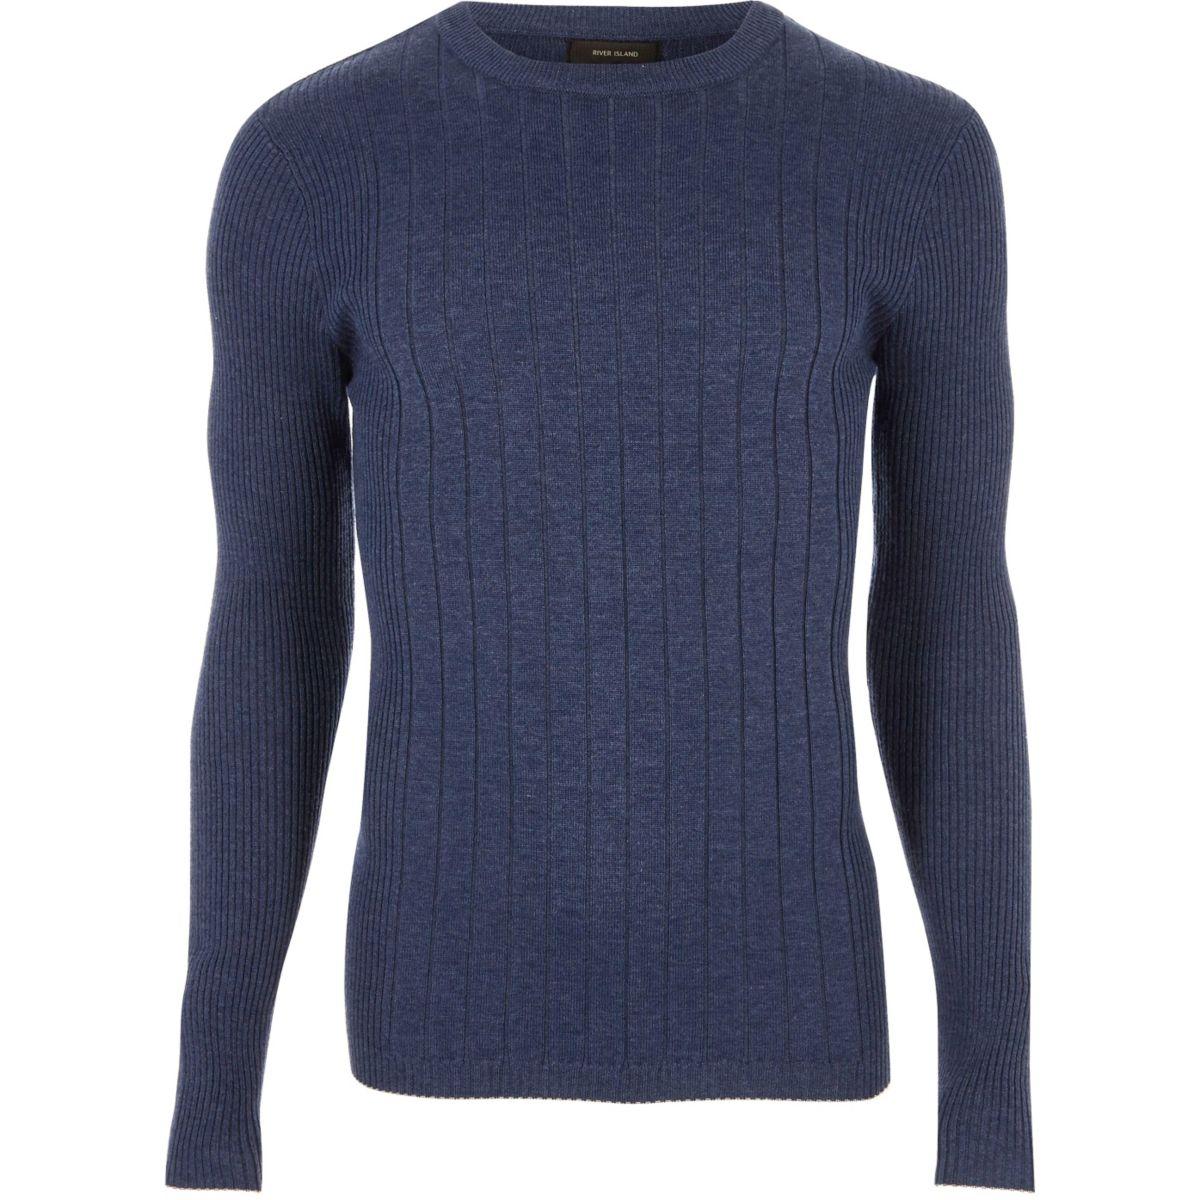 Blauwe geribbelde aansluitende pullover